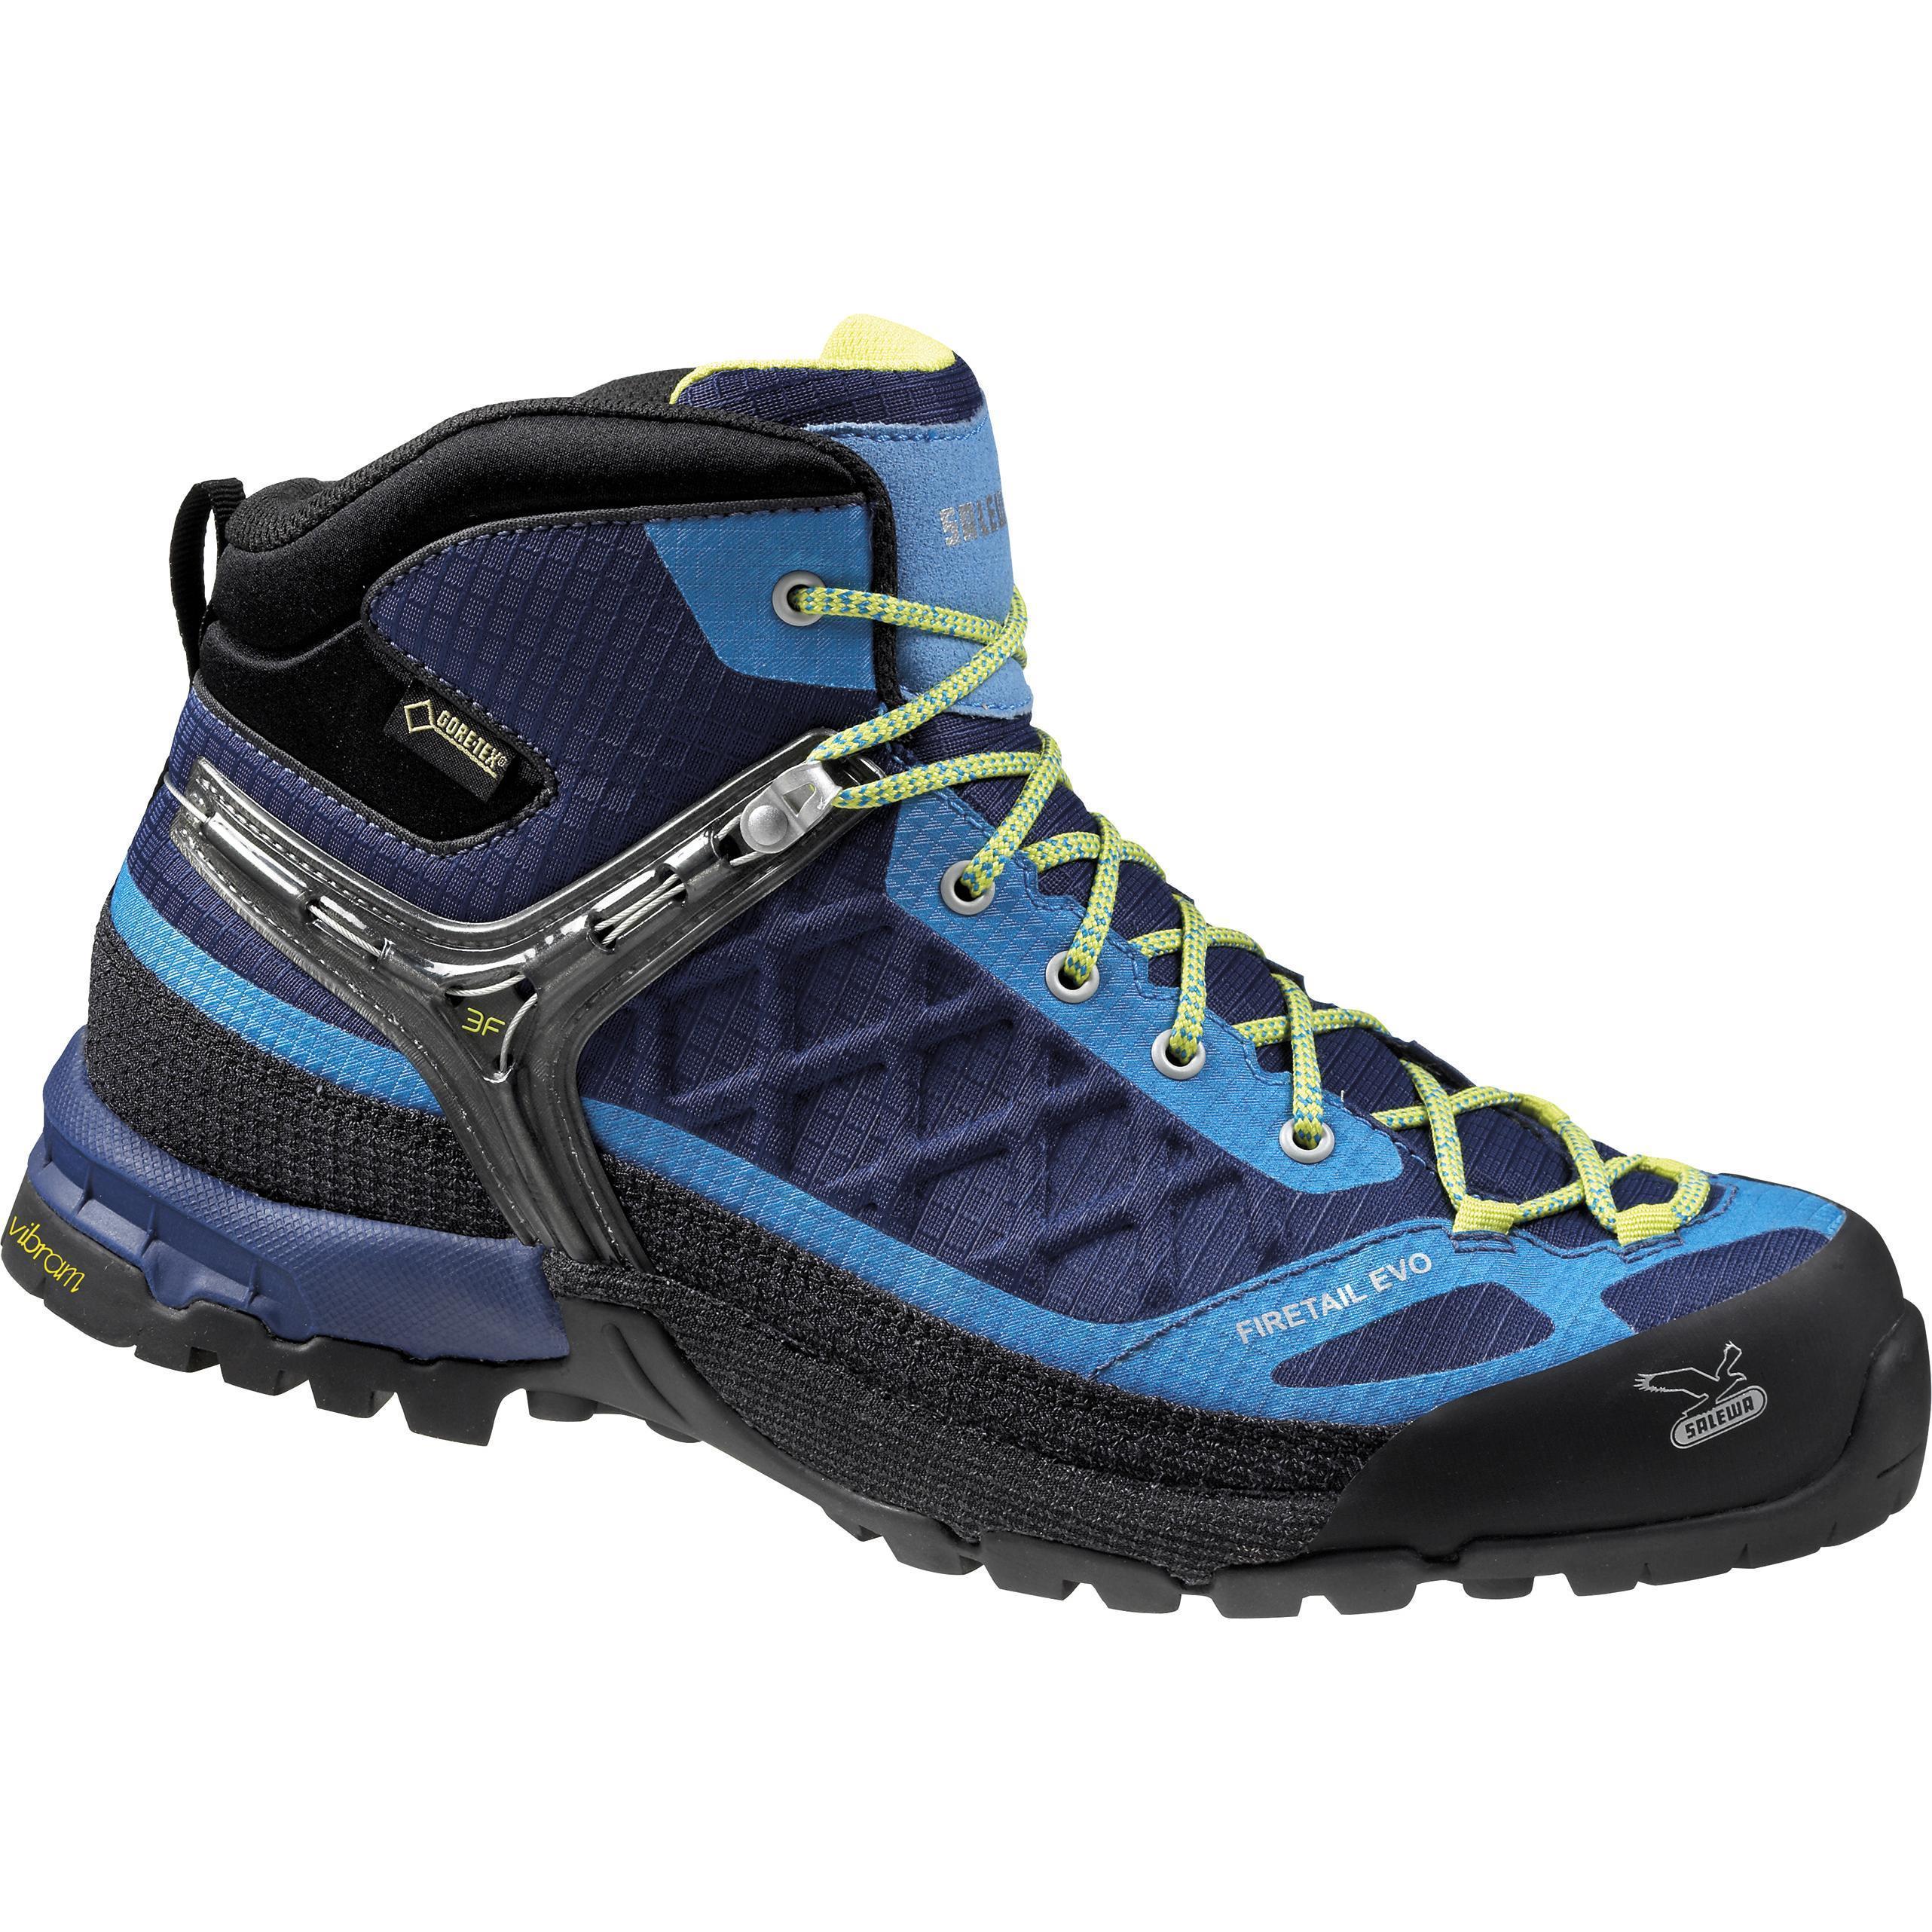 Купить Ботинки для треккинга (высокие) Salewa Tech Approach MS FIRETAIL EVO MID GTX Deep Blue/Davos, Треккинговые ботинки, 1090318